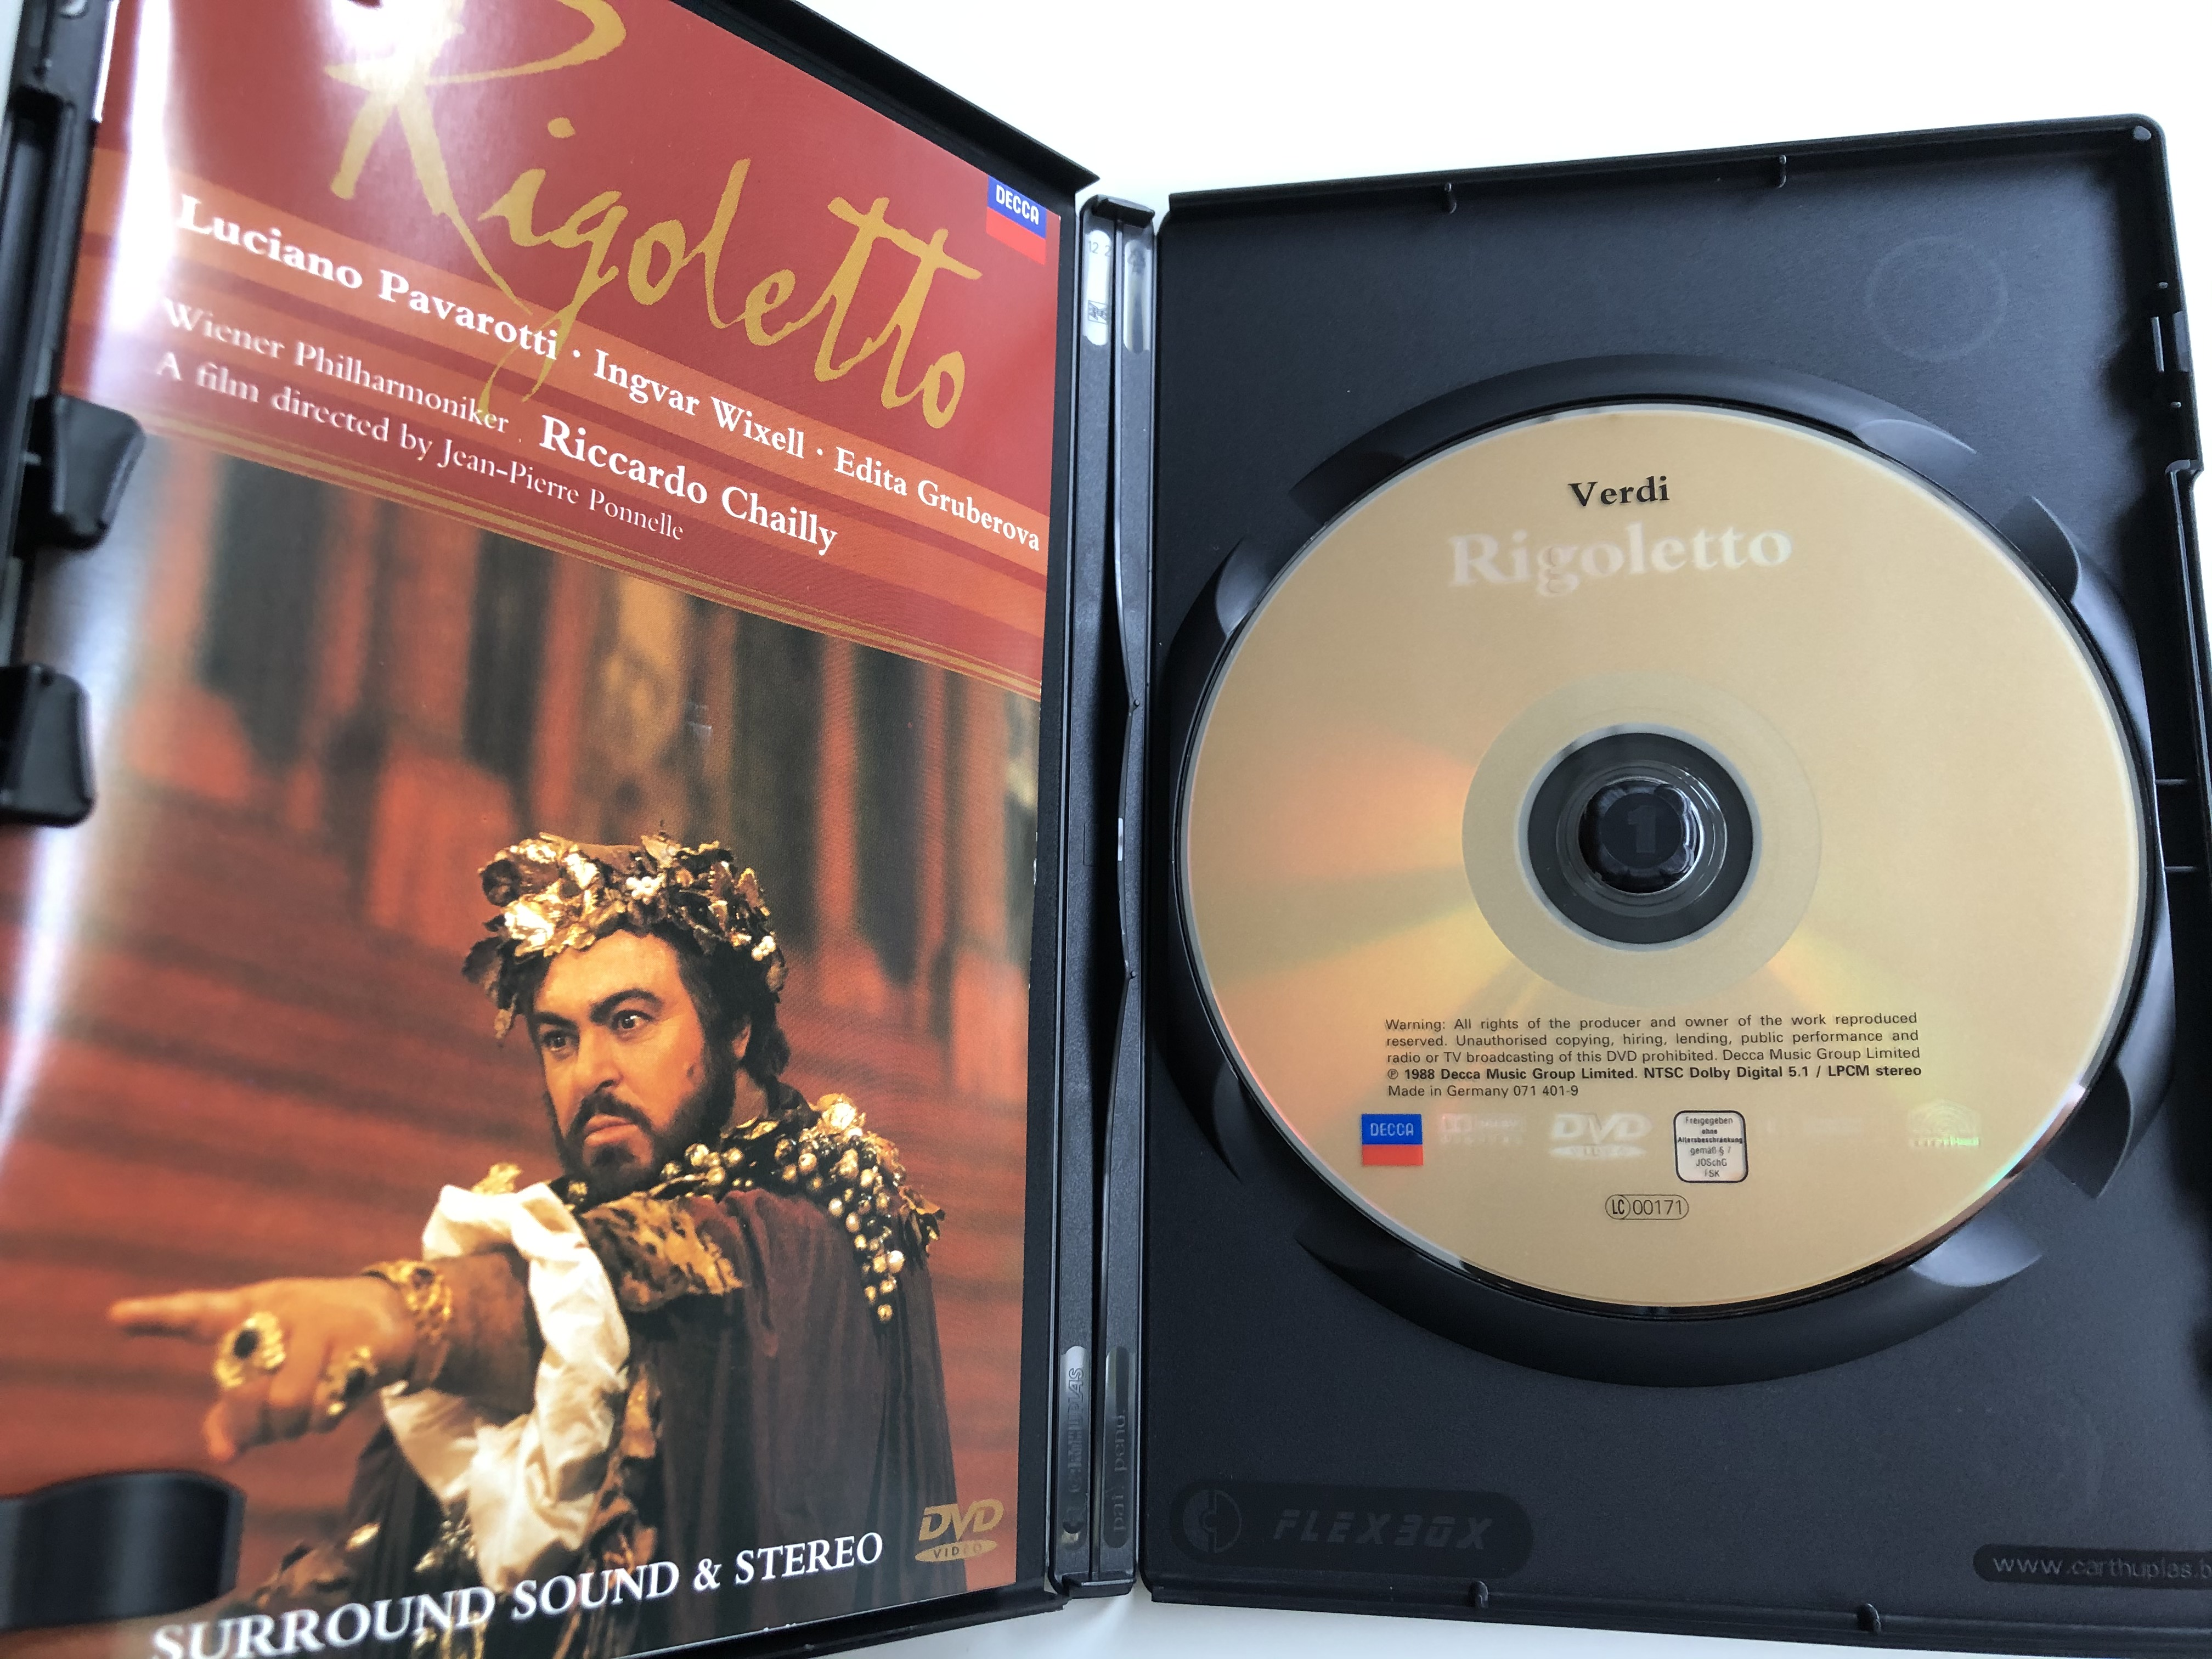 giuseppe-verdi-rigoletto-dvd-1998-directed-by-jean-pierre-ponnelle-2.jpg